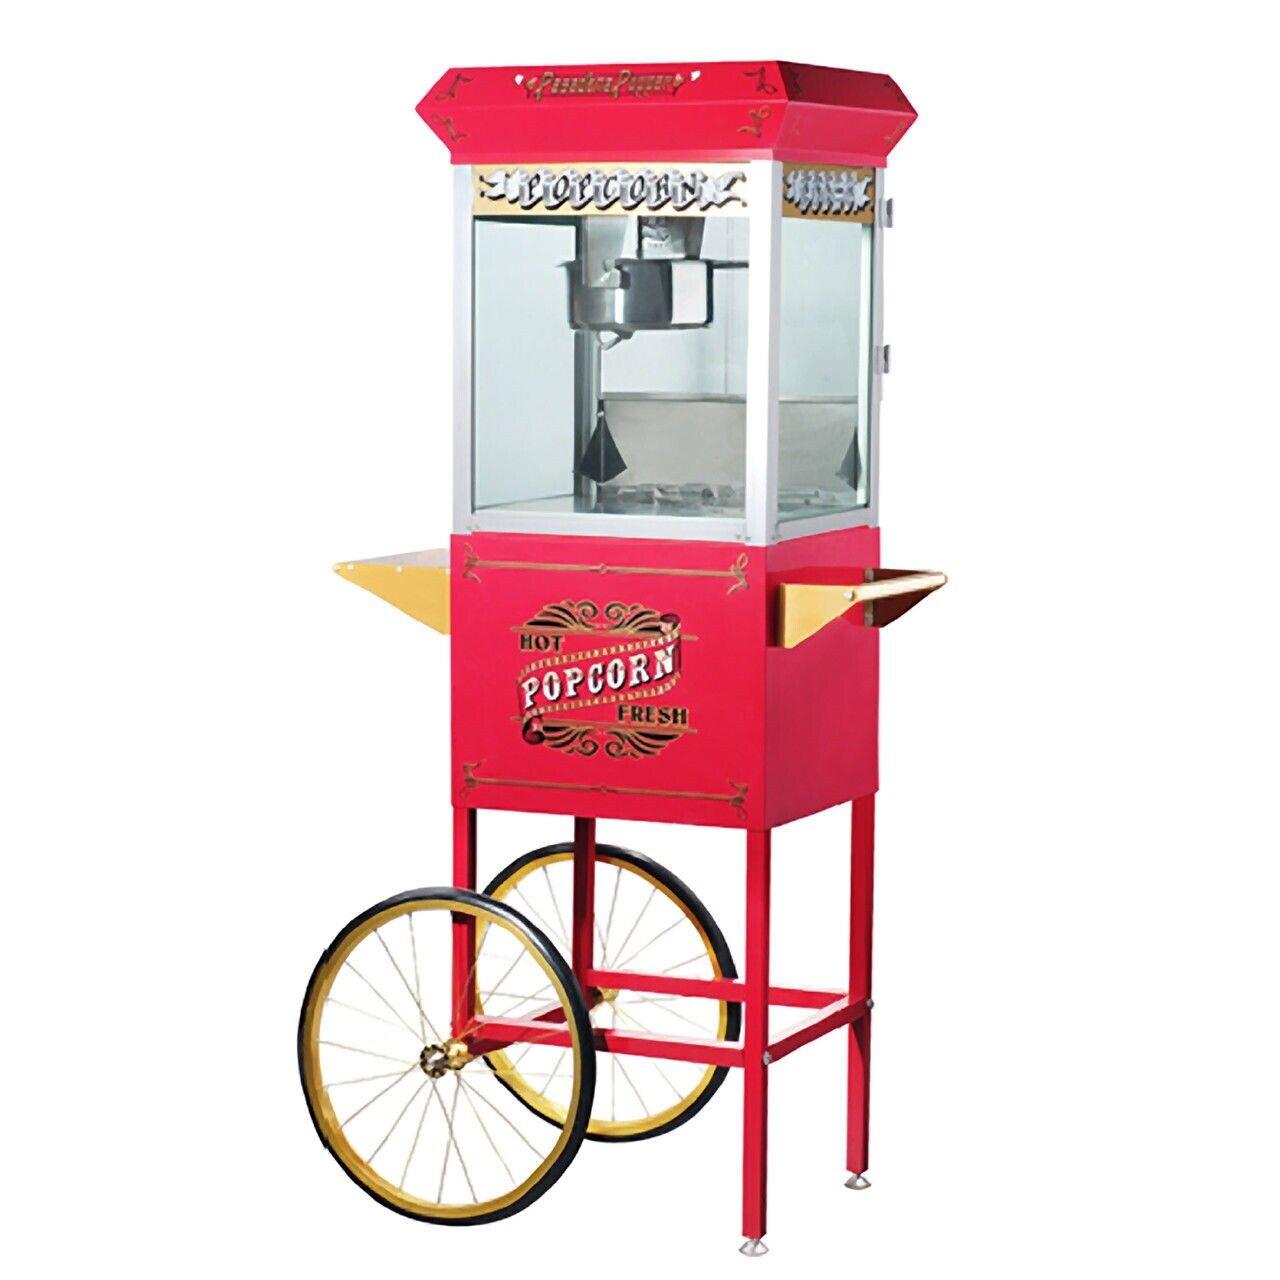 6040 Great Northern Pasadena Popcorn Popper Machine with Car